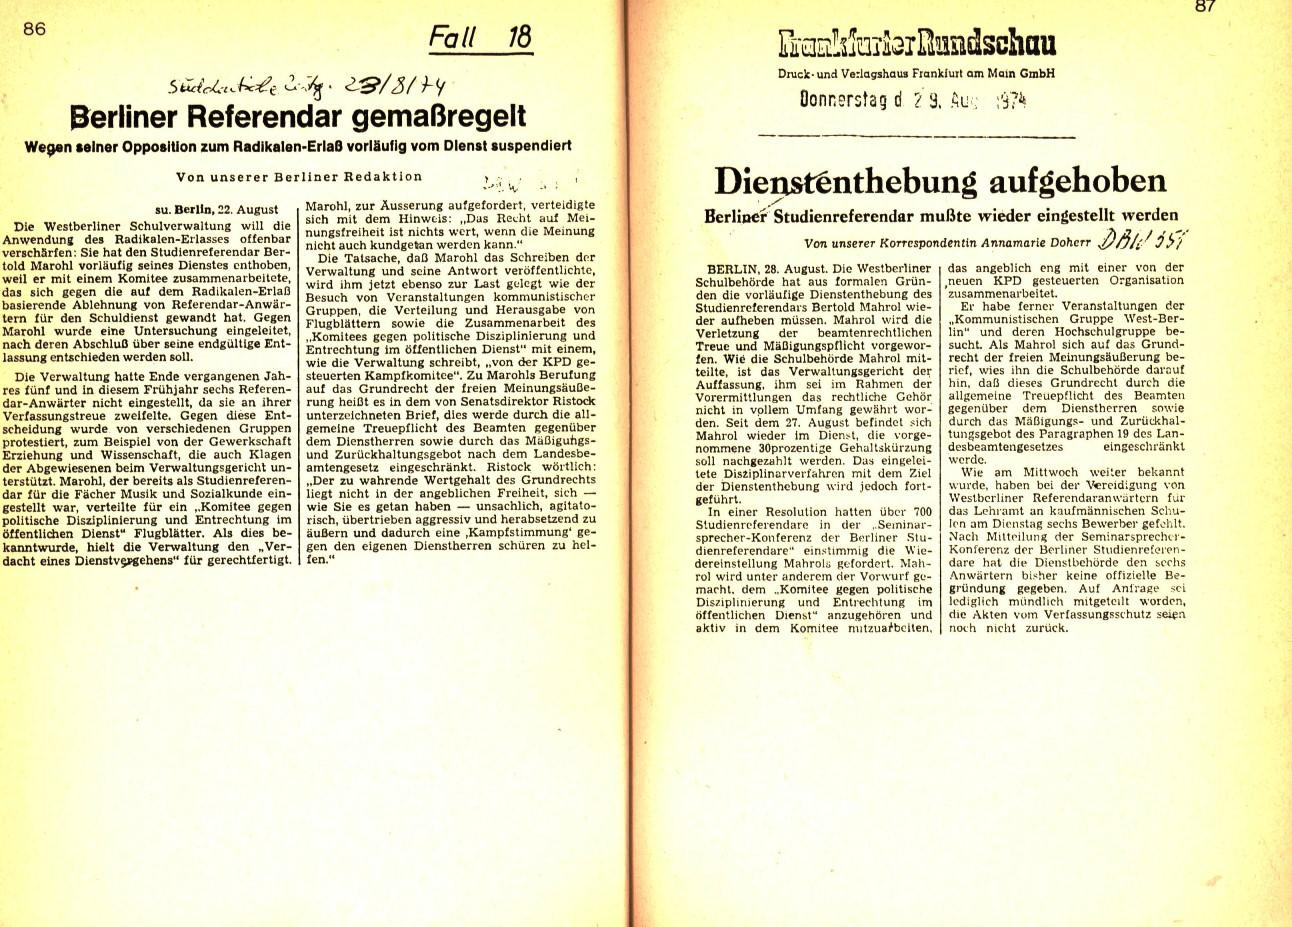 Berlin_VDS_Aktionskomitee_1975_BerufsverboteII_45